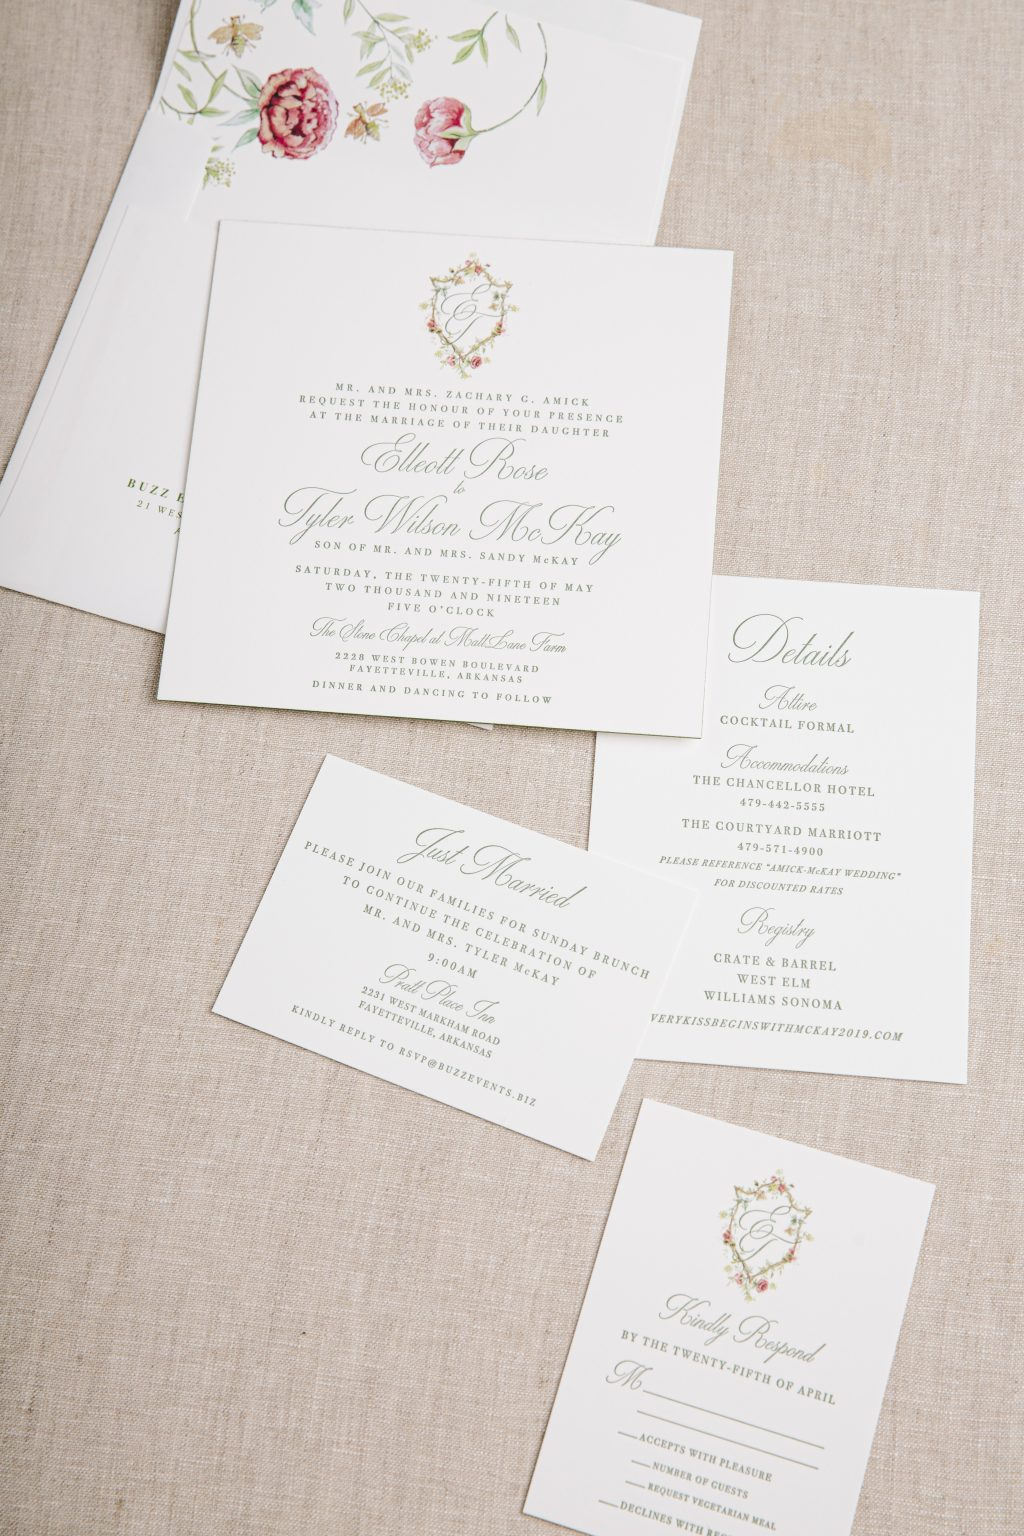 Floral monogrammed letterpress invitations